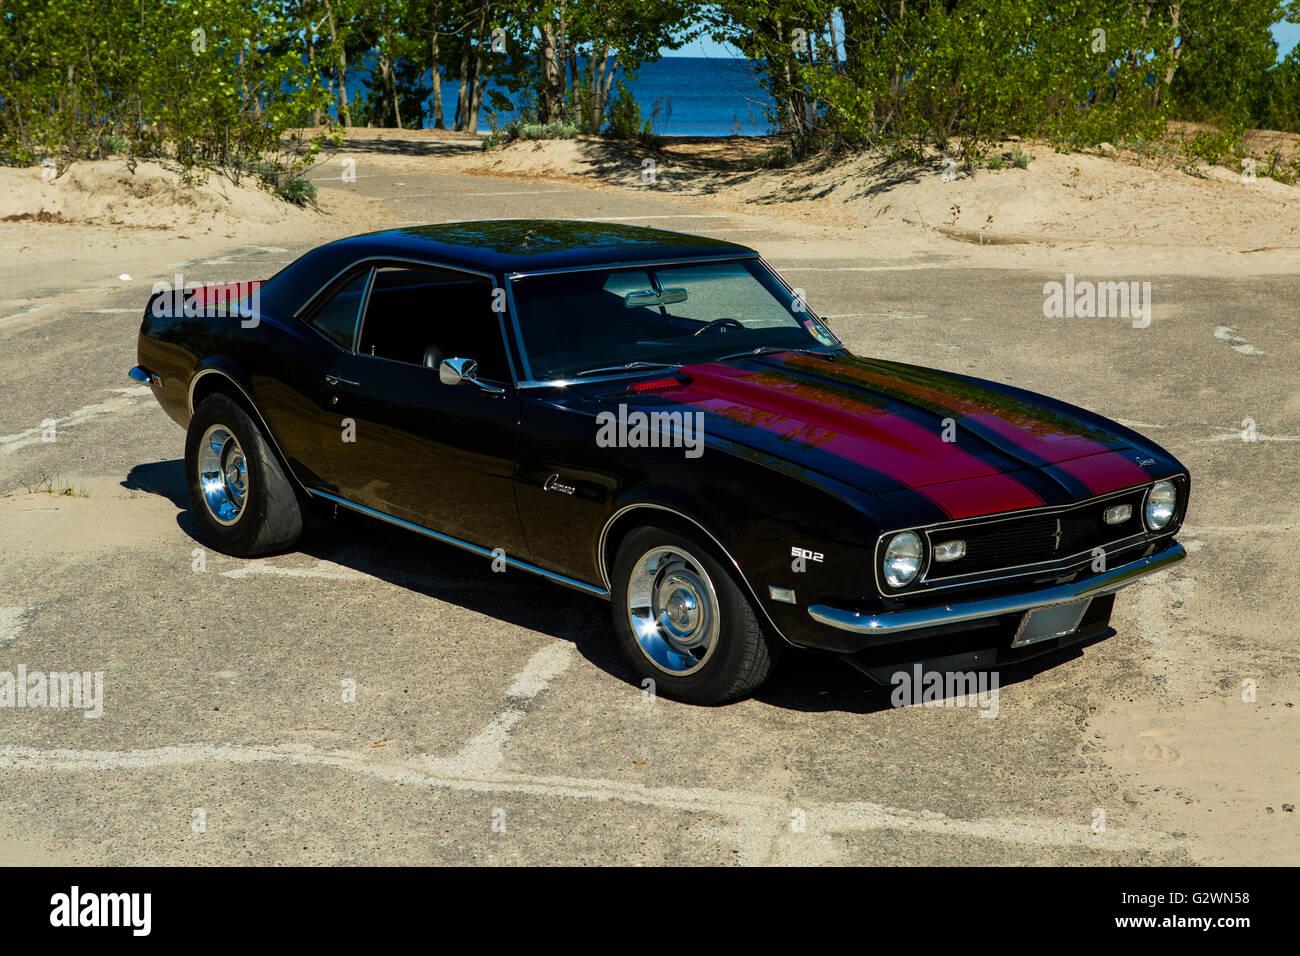 1968 Chevrolet Camaro Stockfoto Bild 105056932 Alamy Ad